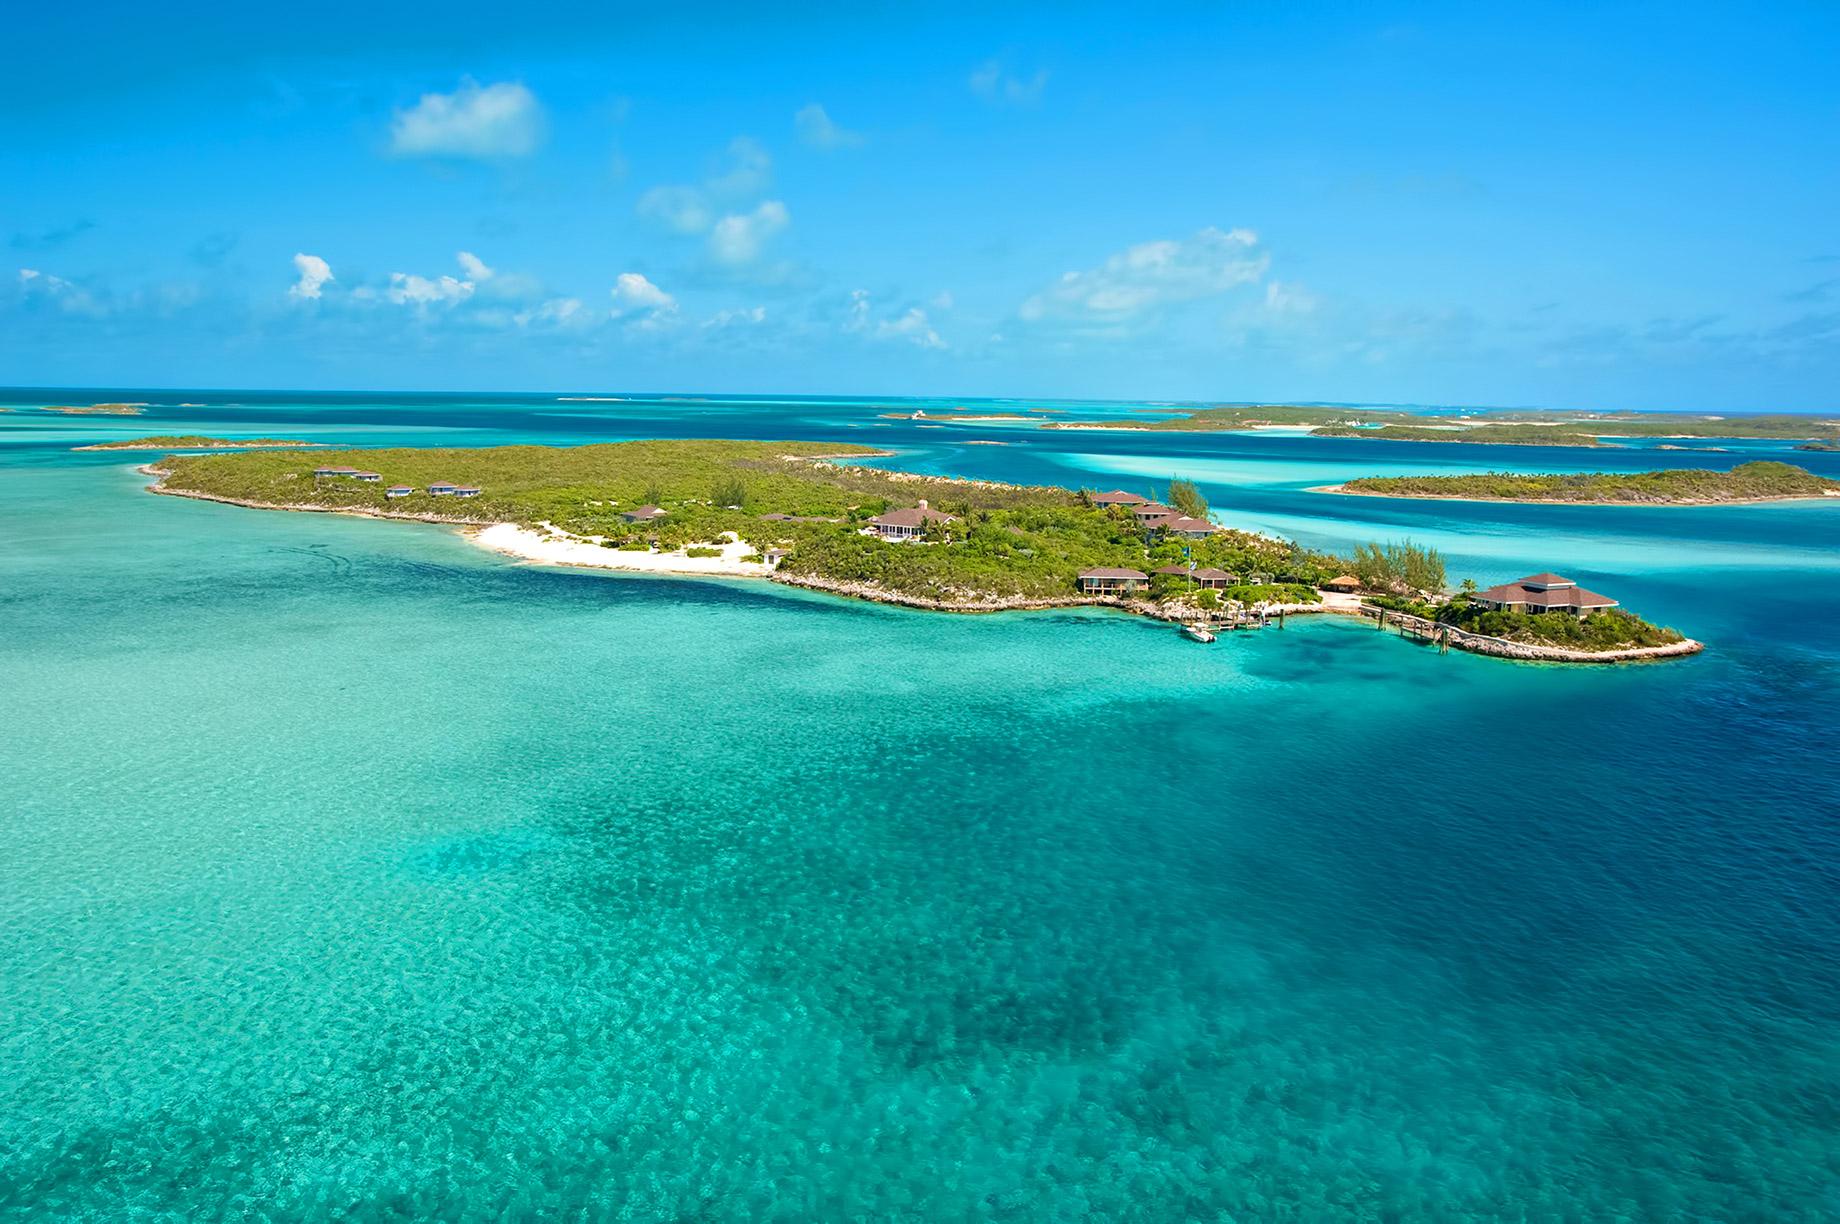 Enjoy Fowl Cay Island – Take A Luxury Getaway To The Bahamas